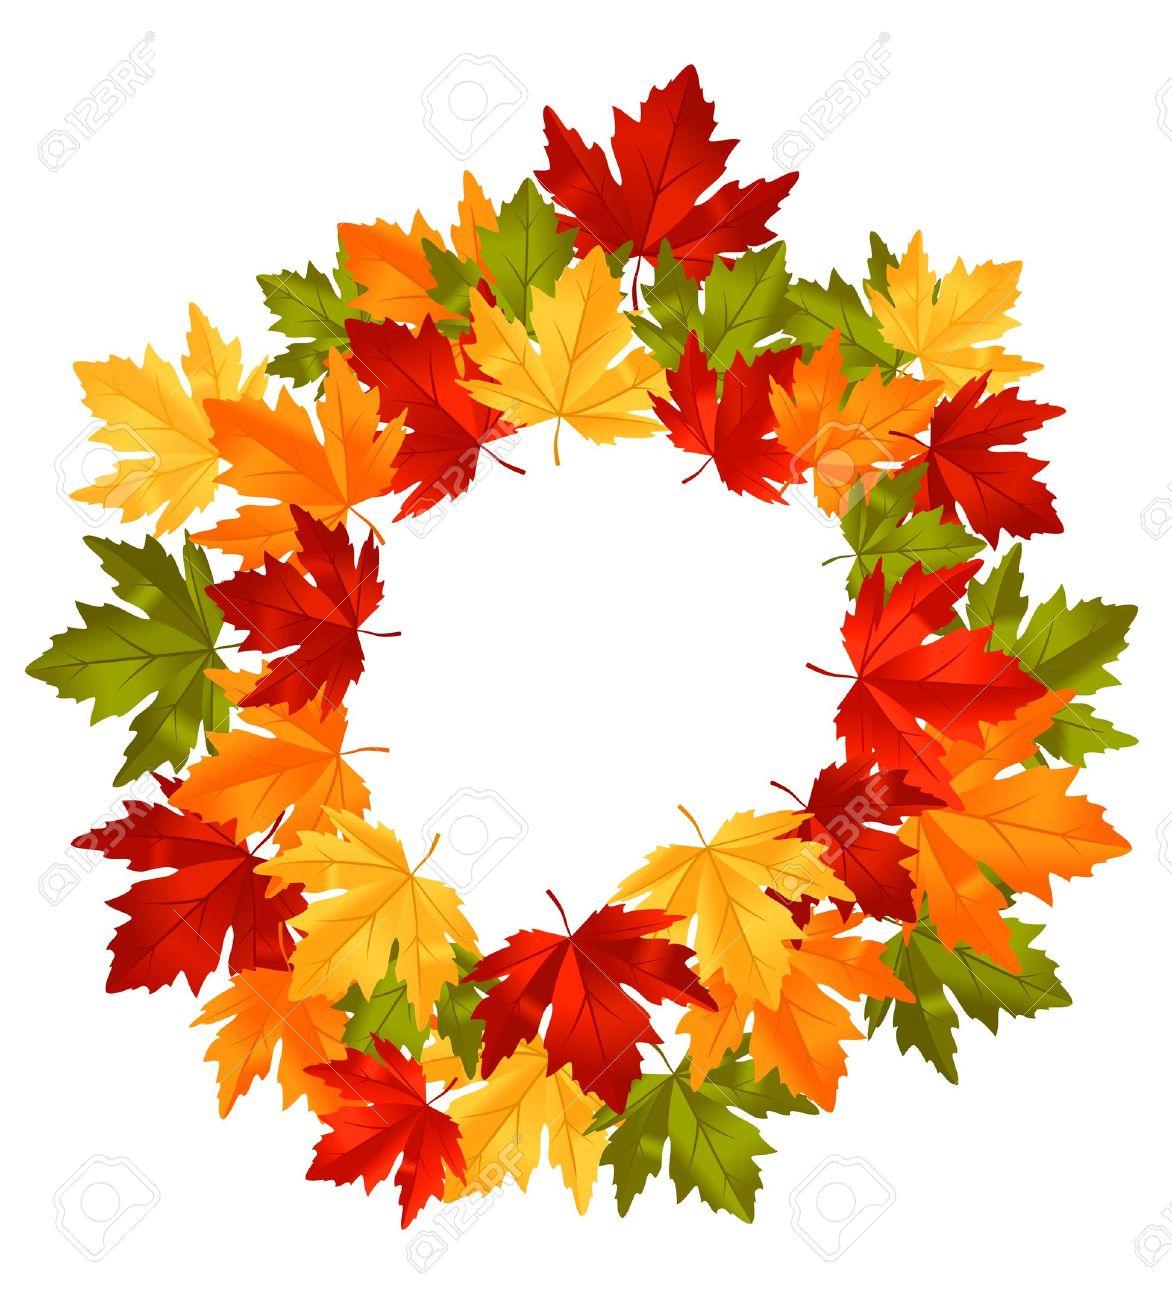 Autumn Falling Leaves In Frame For Seasonal Or Thanksgiving Design ...